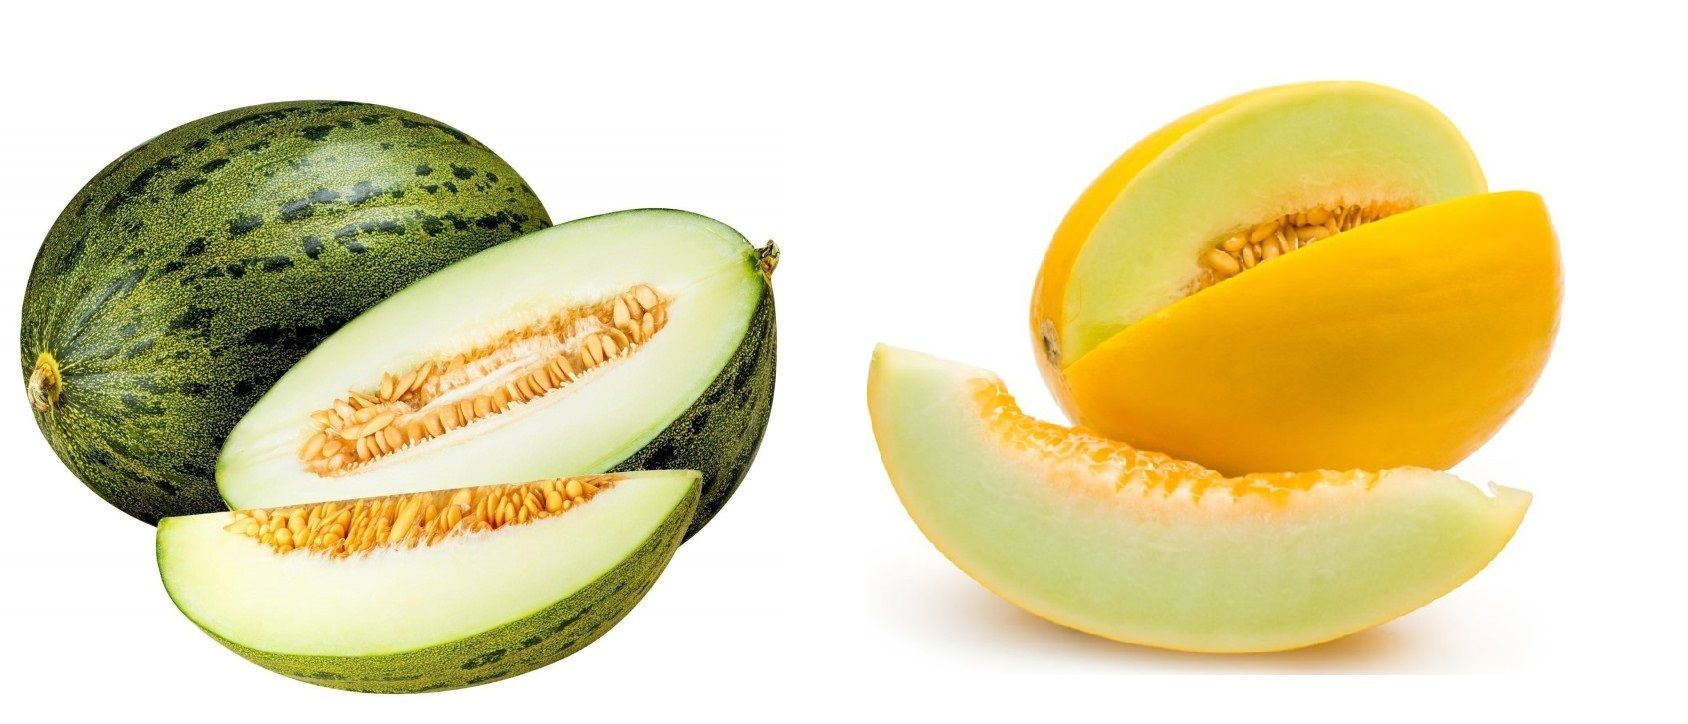 Melón amarillo y melón piel de sapo